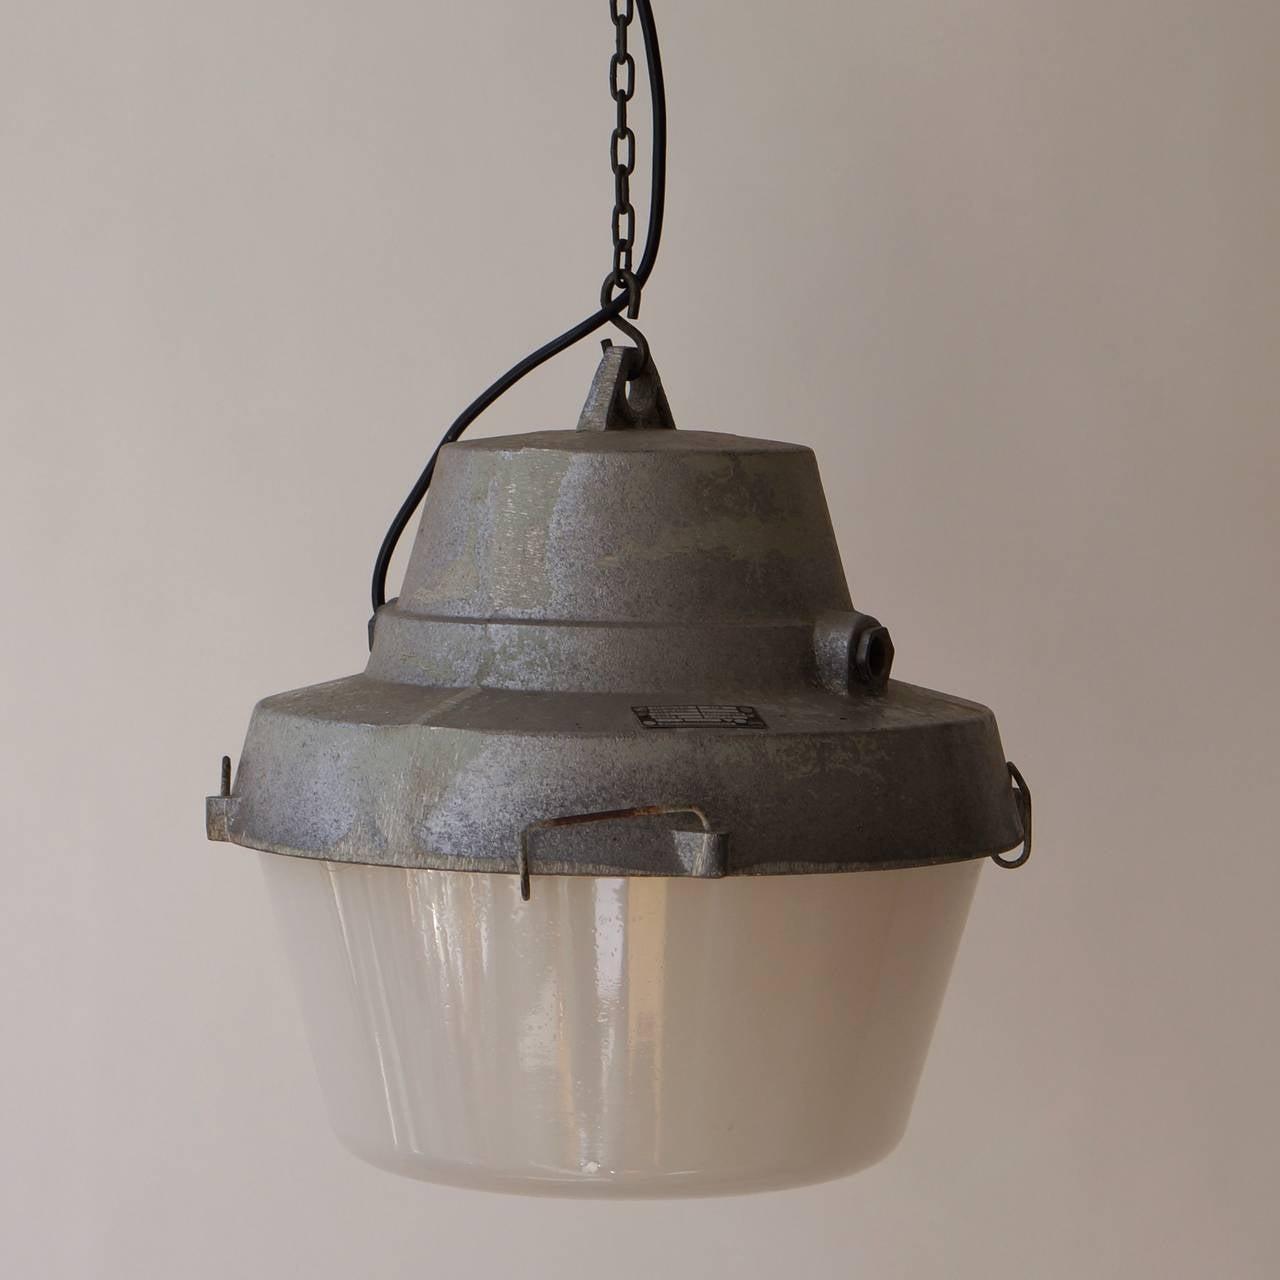 Set of five Industrial pendant lights.